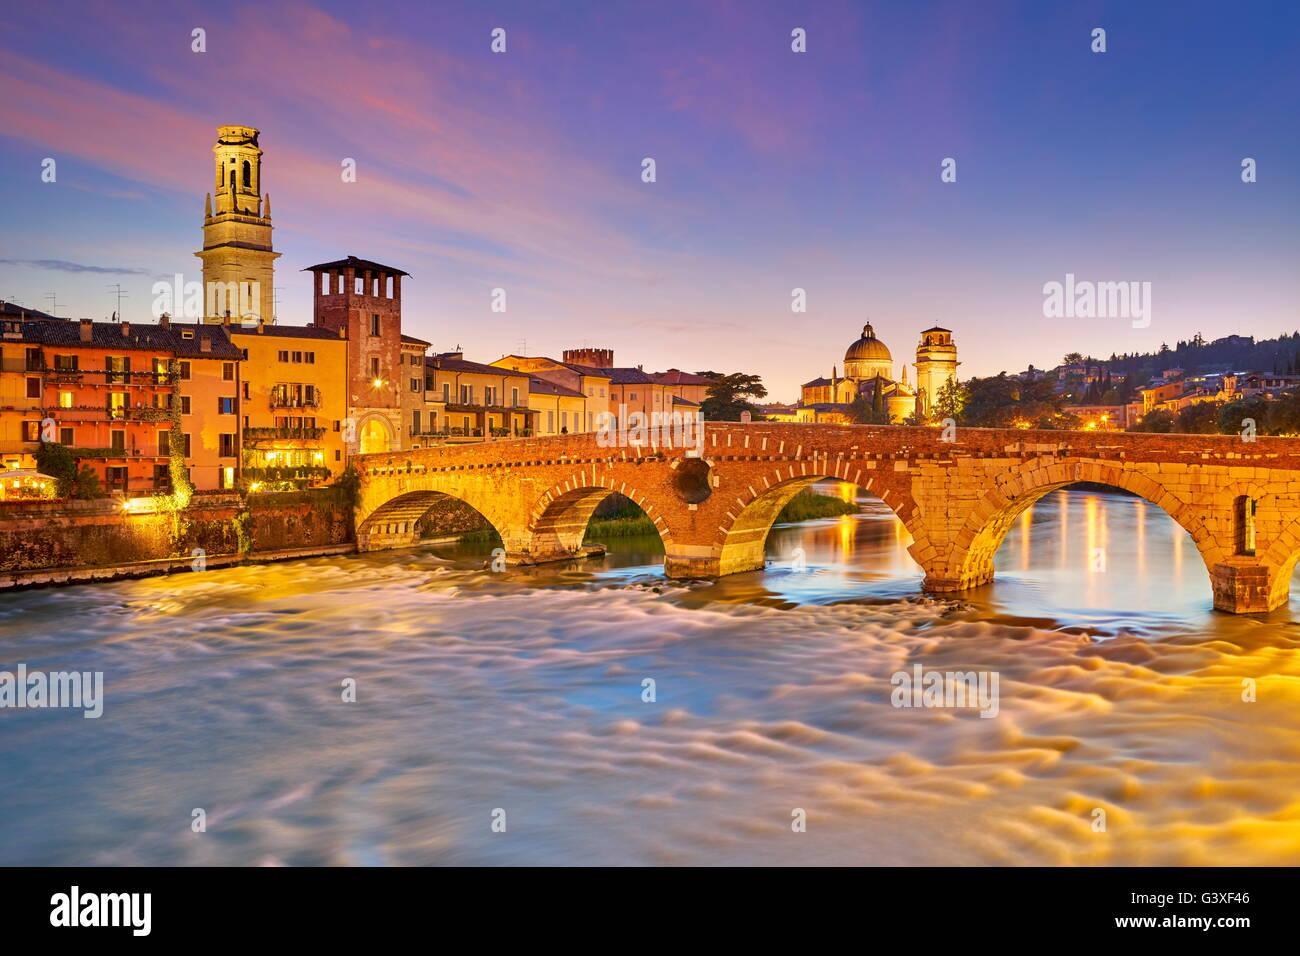 Verona - Ponte Pietra Bridge en la tarde al anochecer, Italia Imagen De Stock